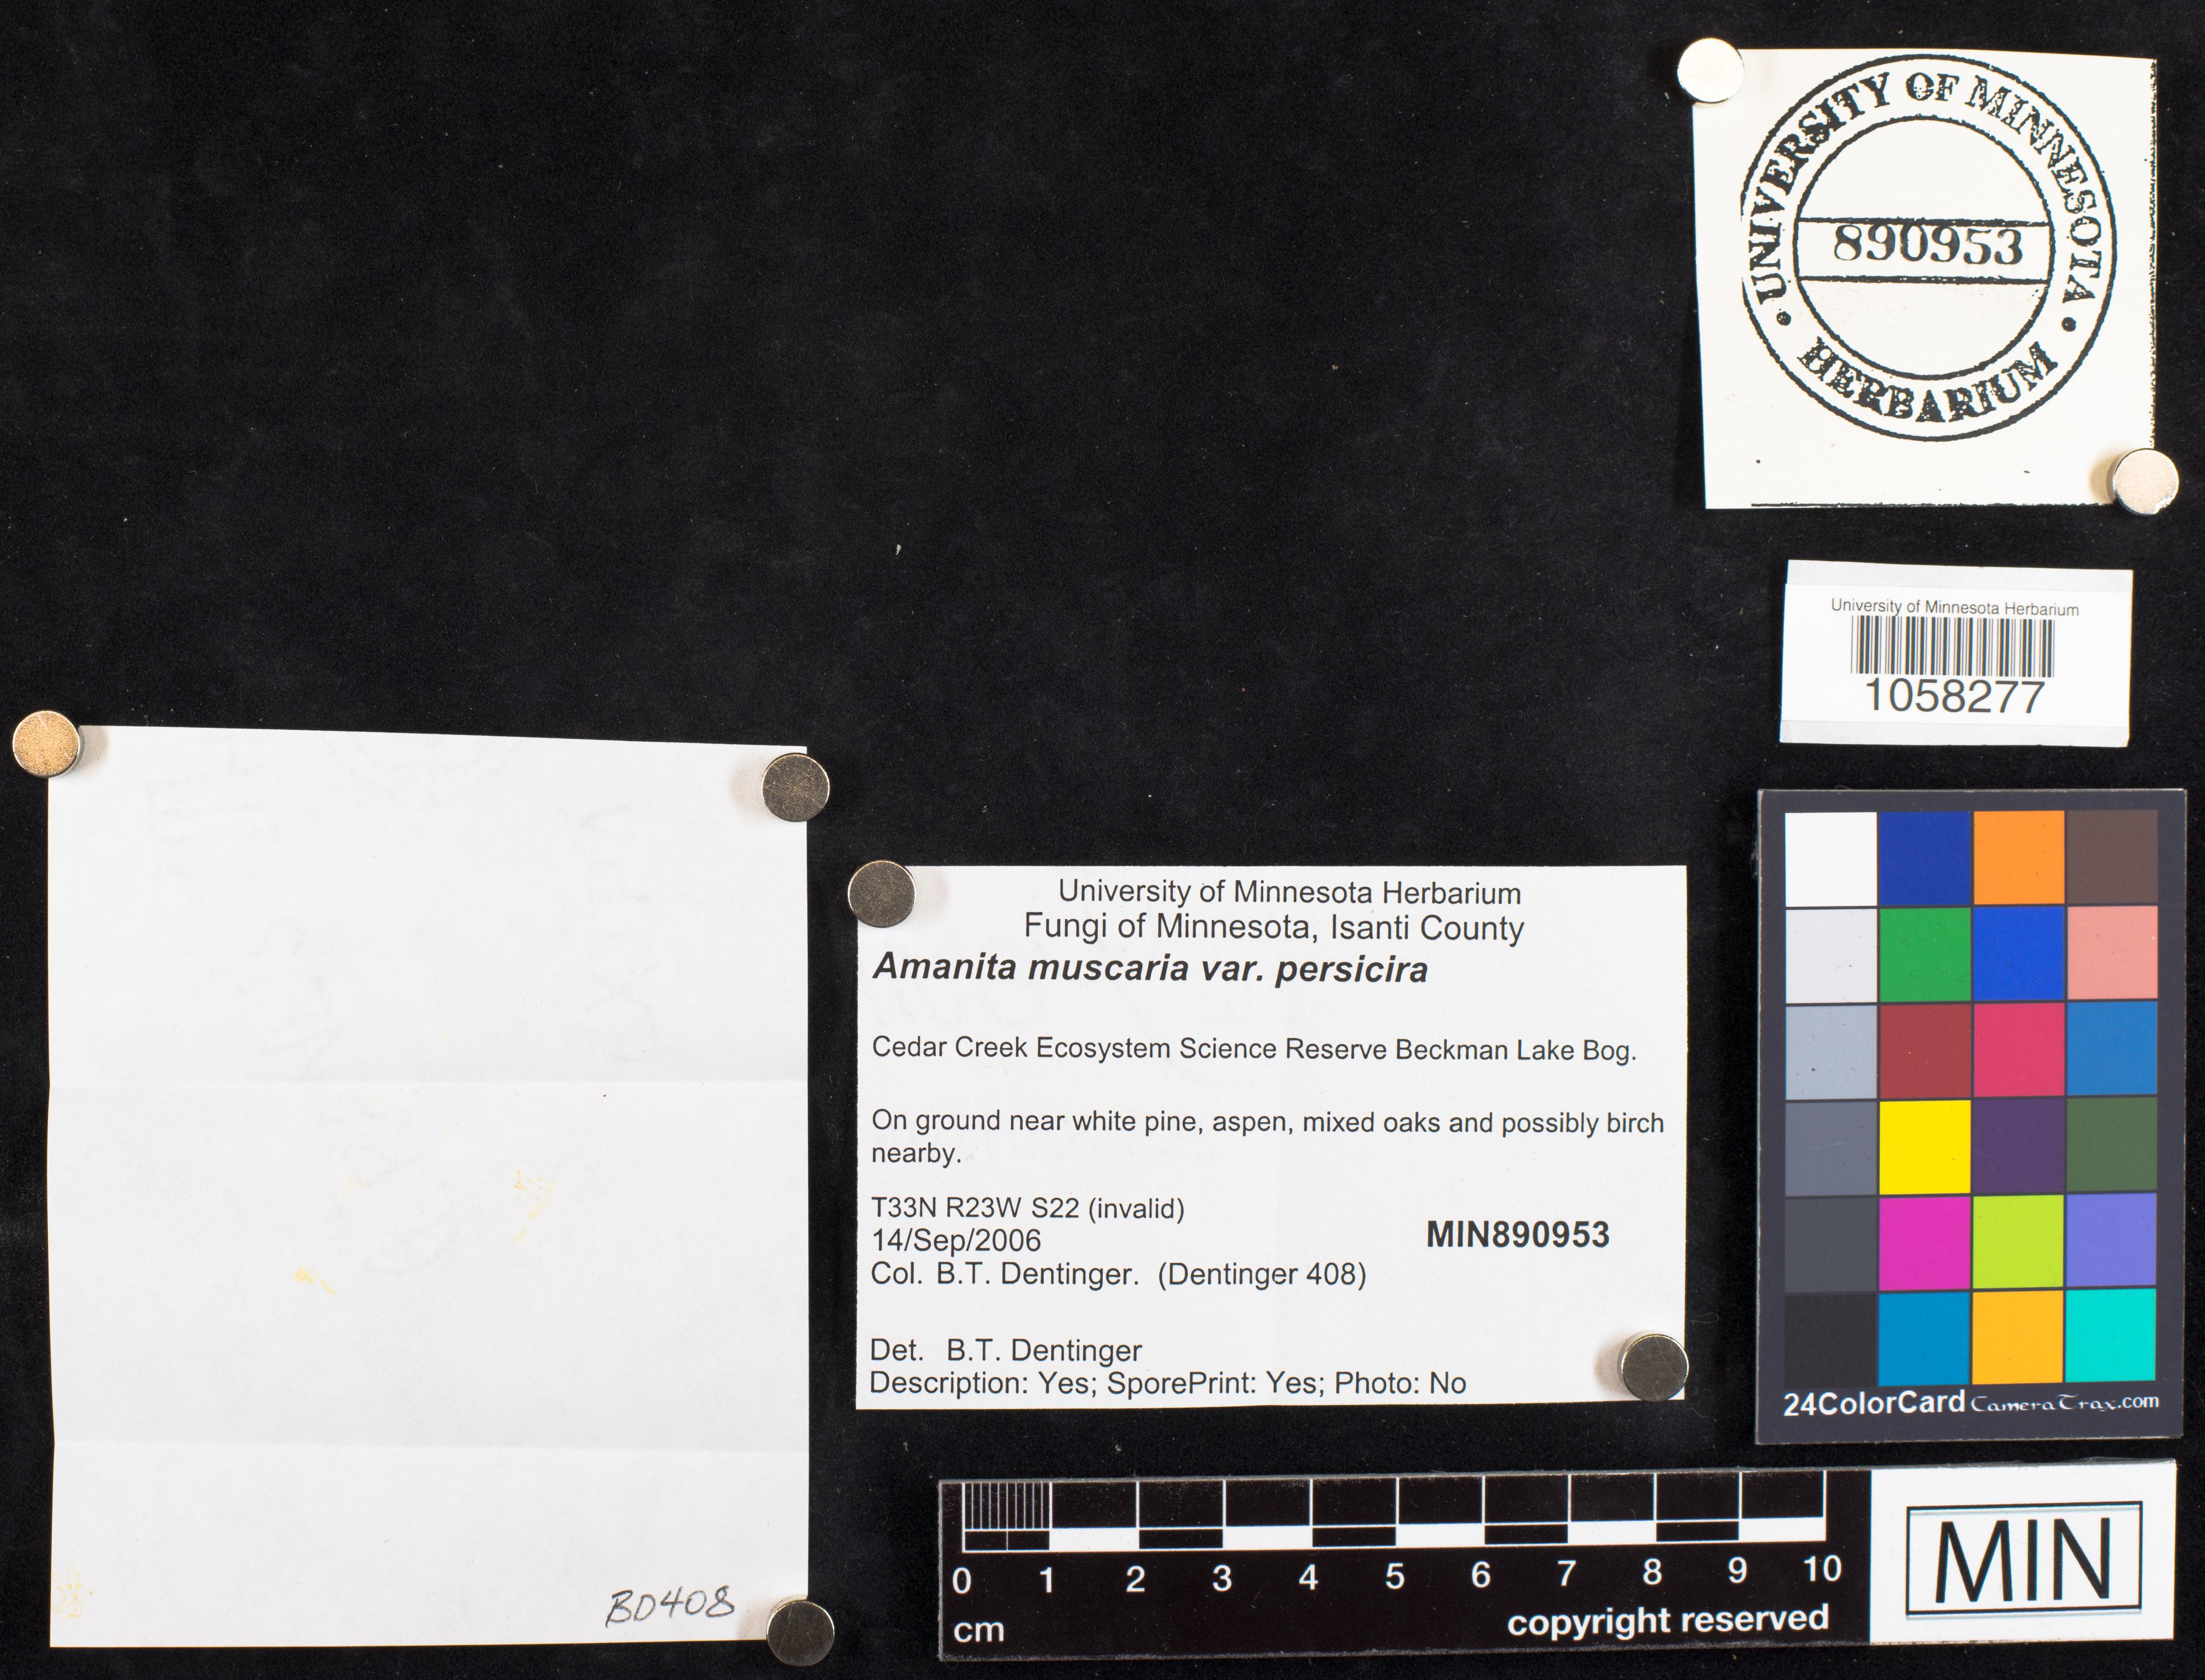 Amanita muscaria var. persicina image